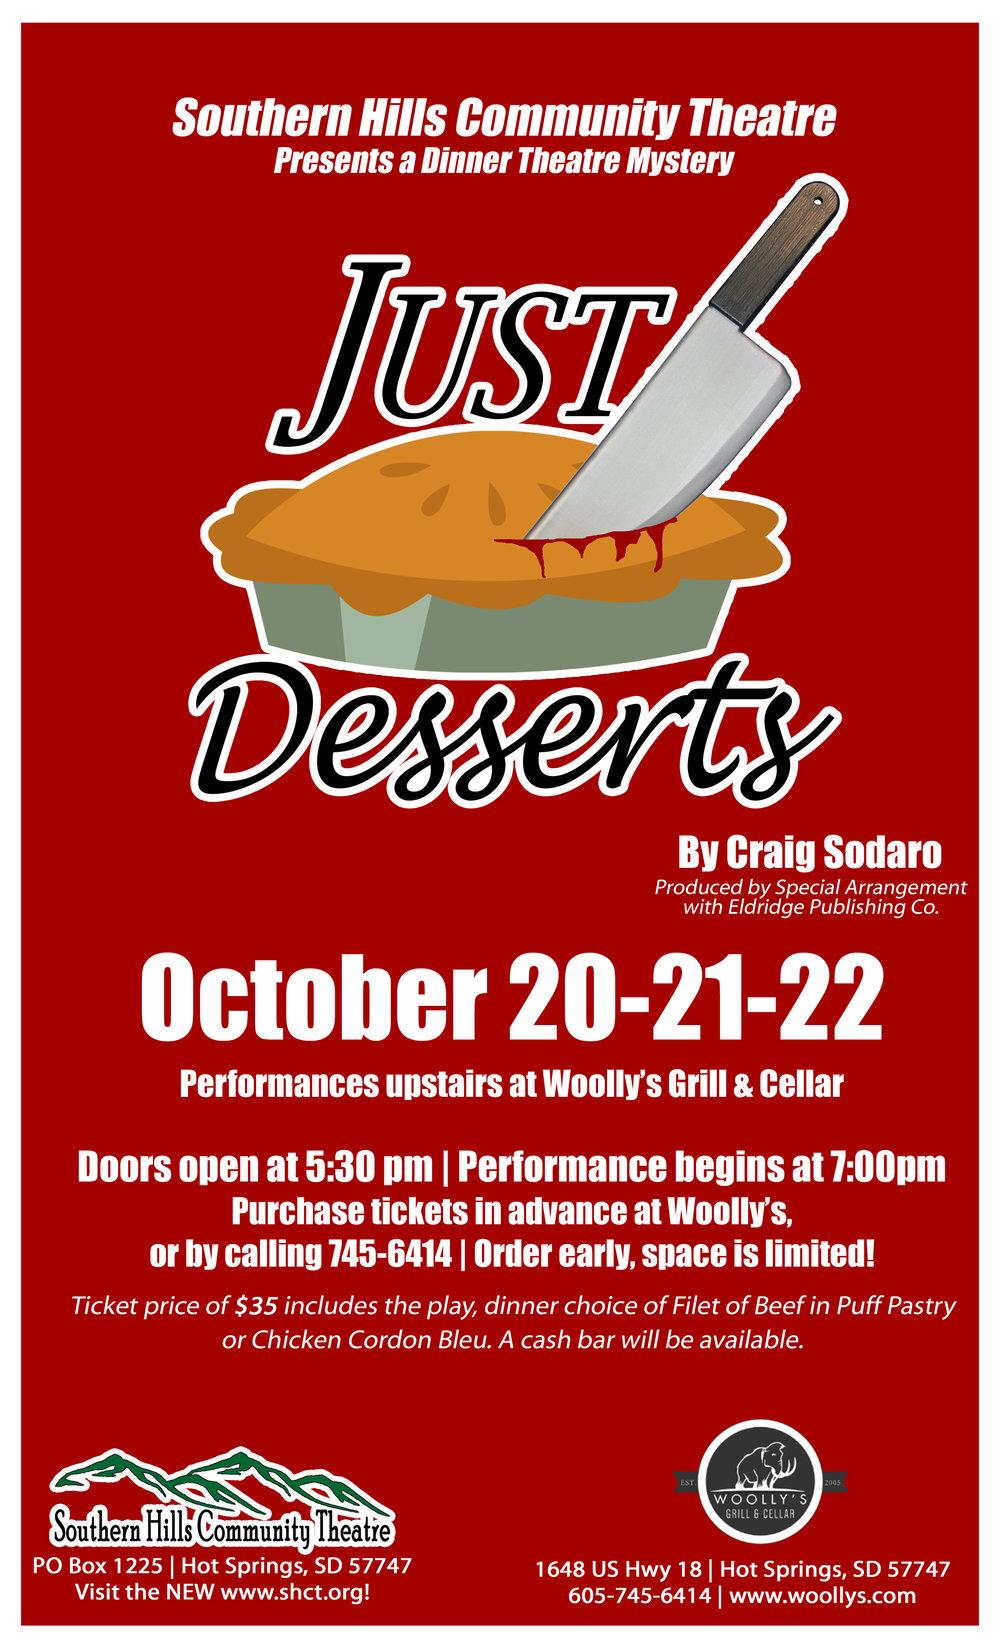 Just Desserts poster 8x14.jpg